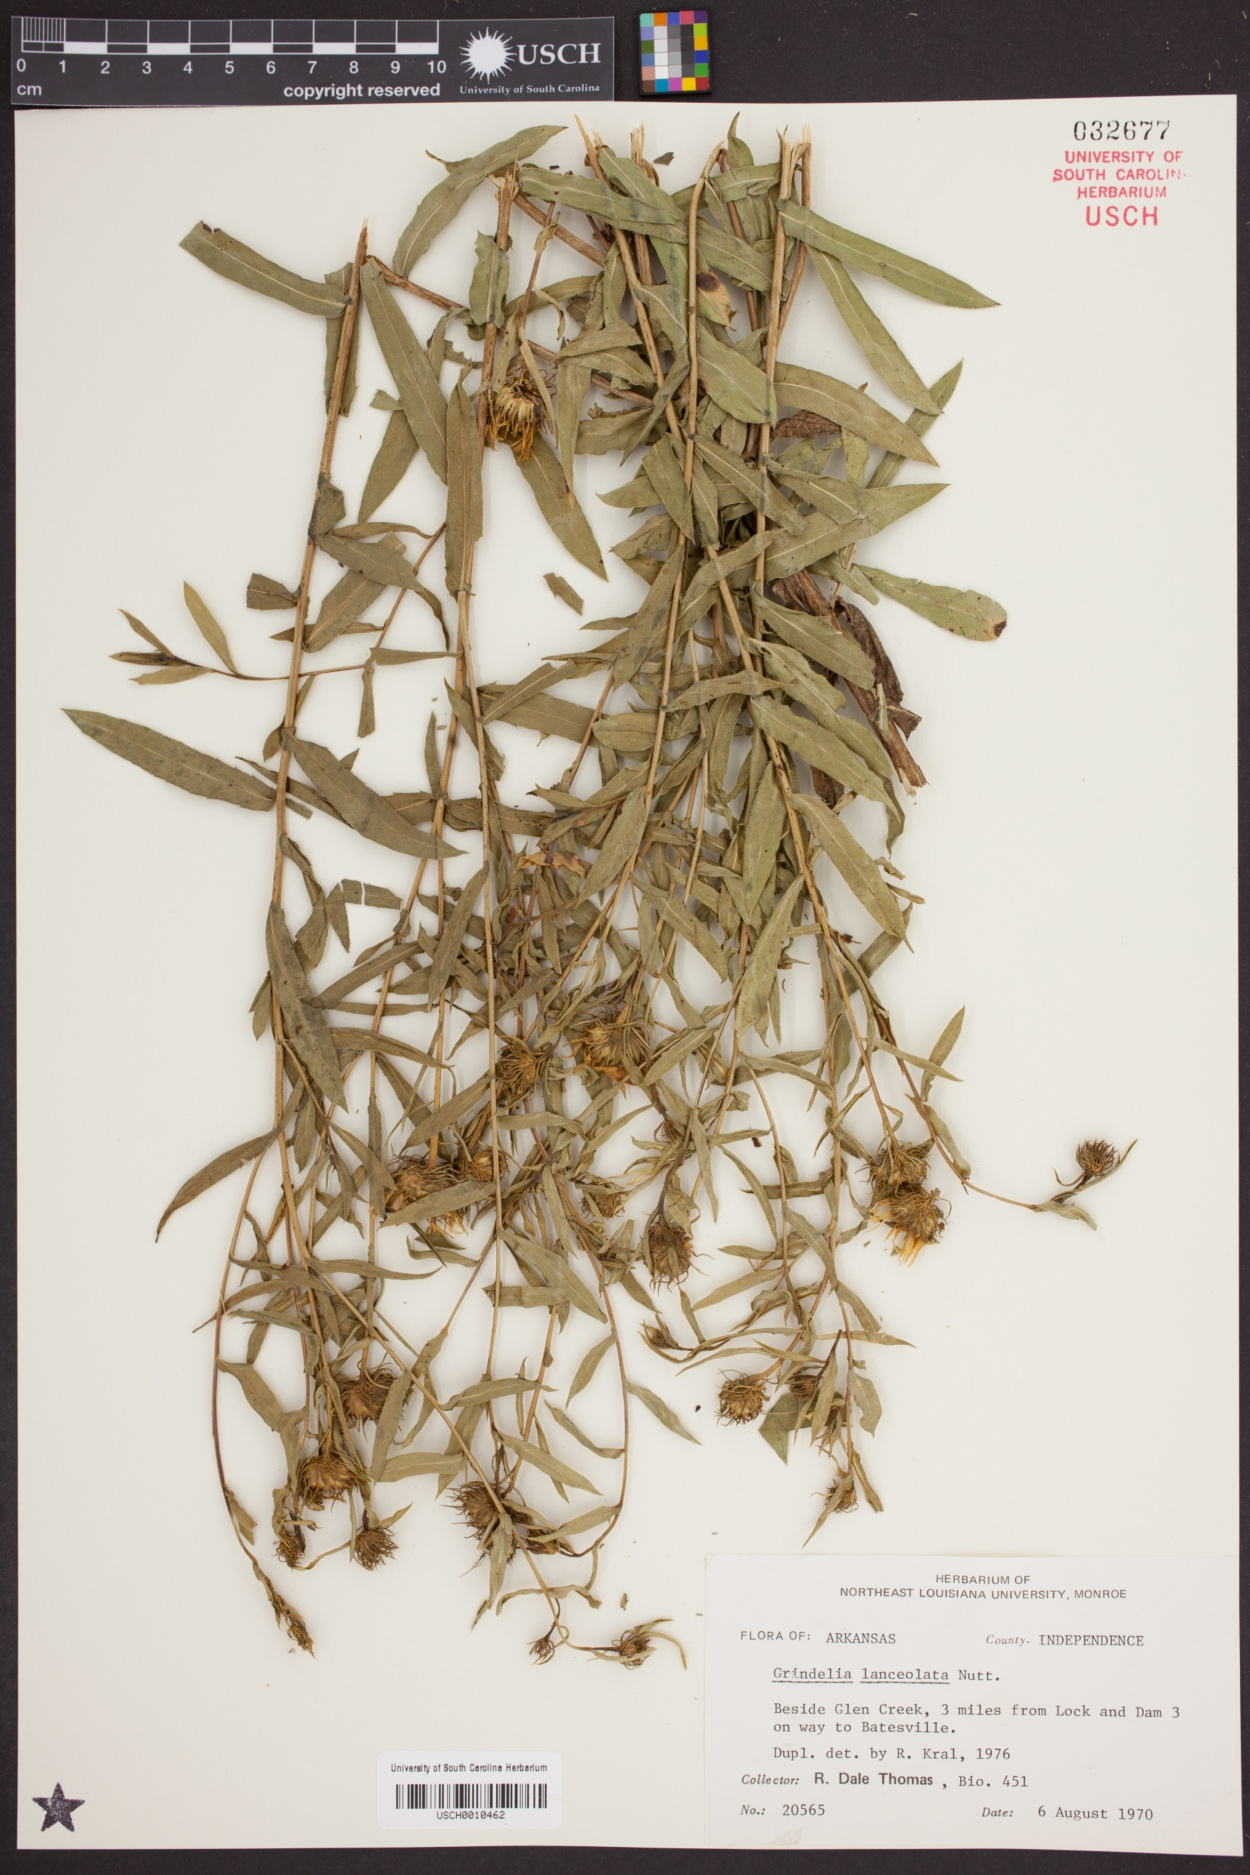 Grindelia lanceolata image